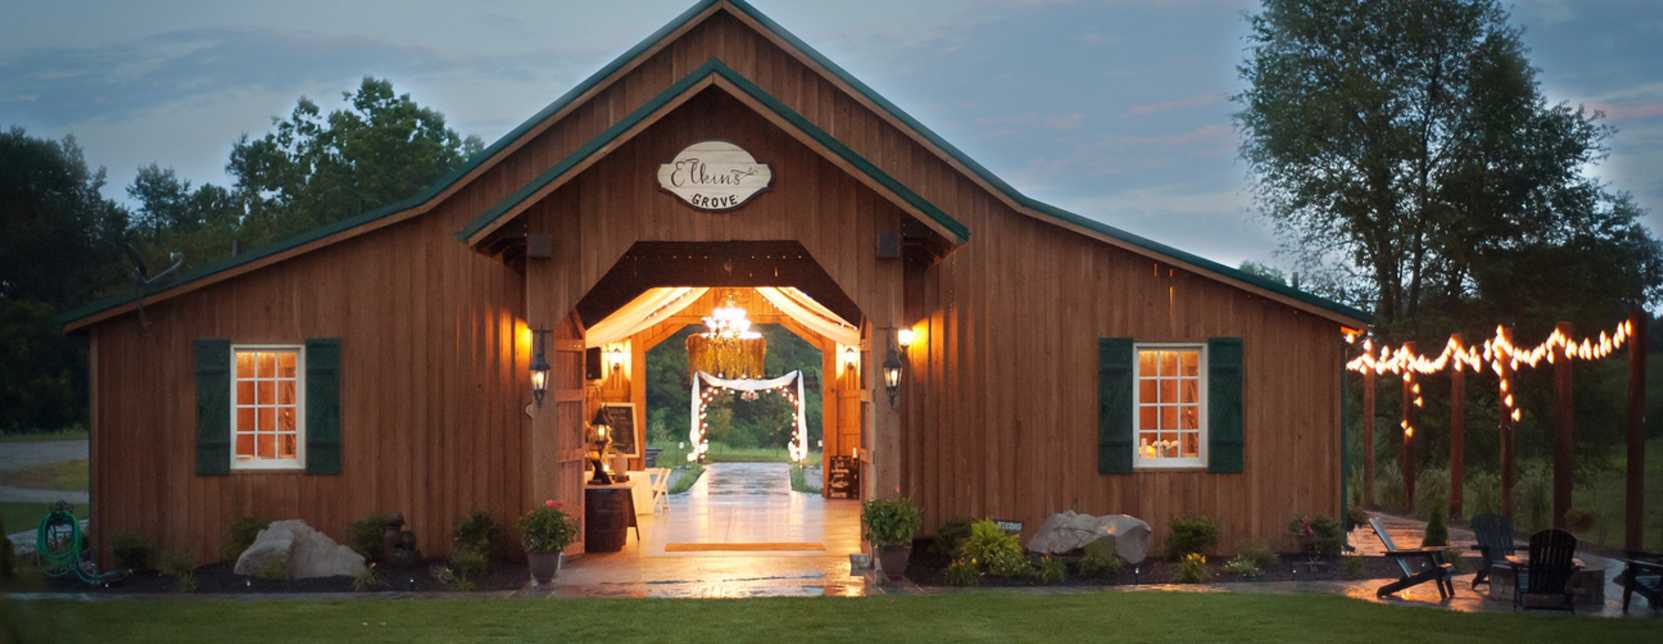 Wedding Venues In Bowling Green Kentucky